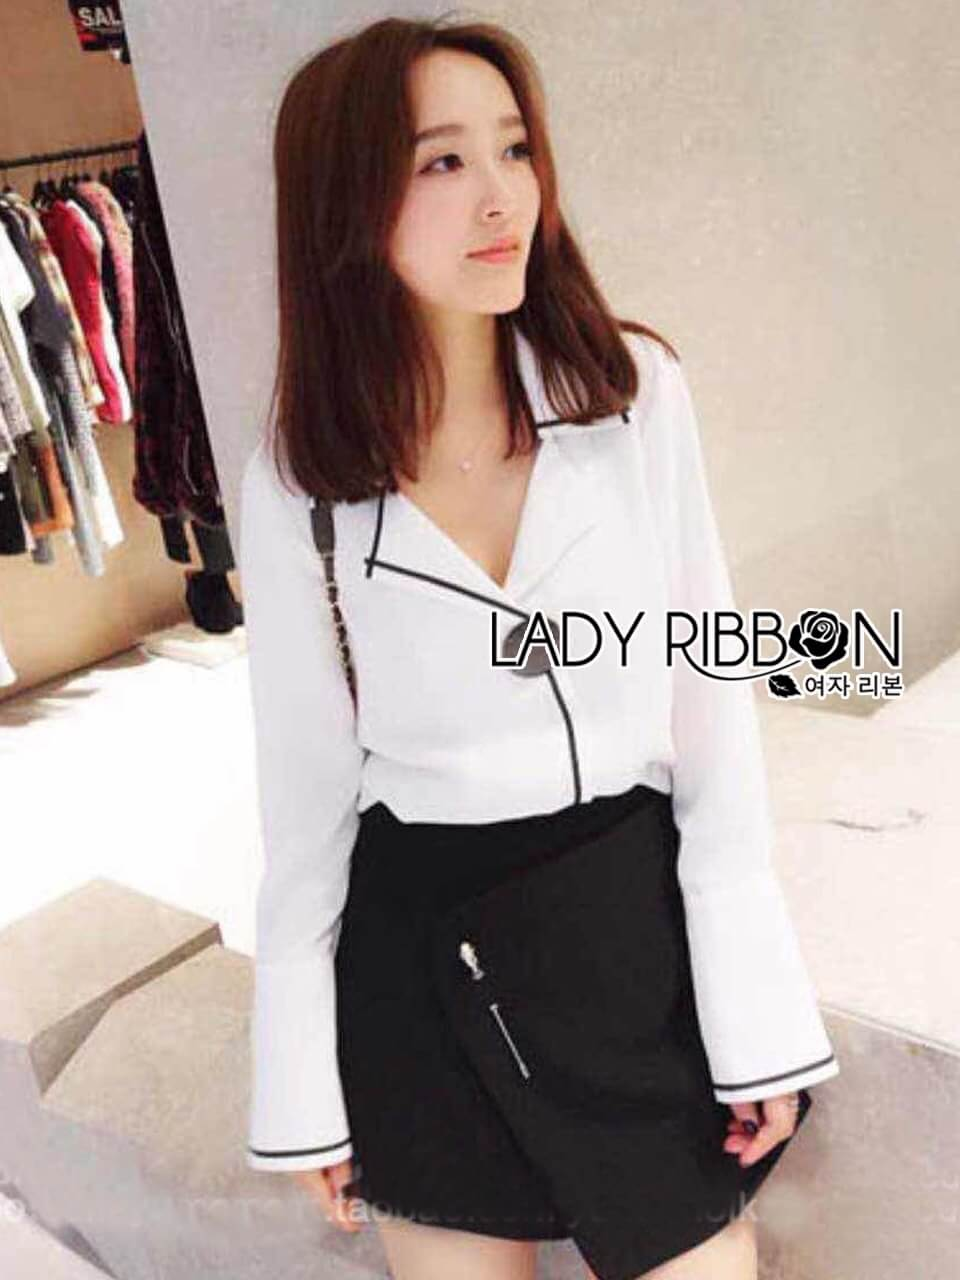 &#x1F380 Lady Ribbon's Made &#x1F380 Lady Grace Minimal Chic Monochrome White Shirt and Black Shorts Set